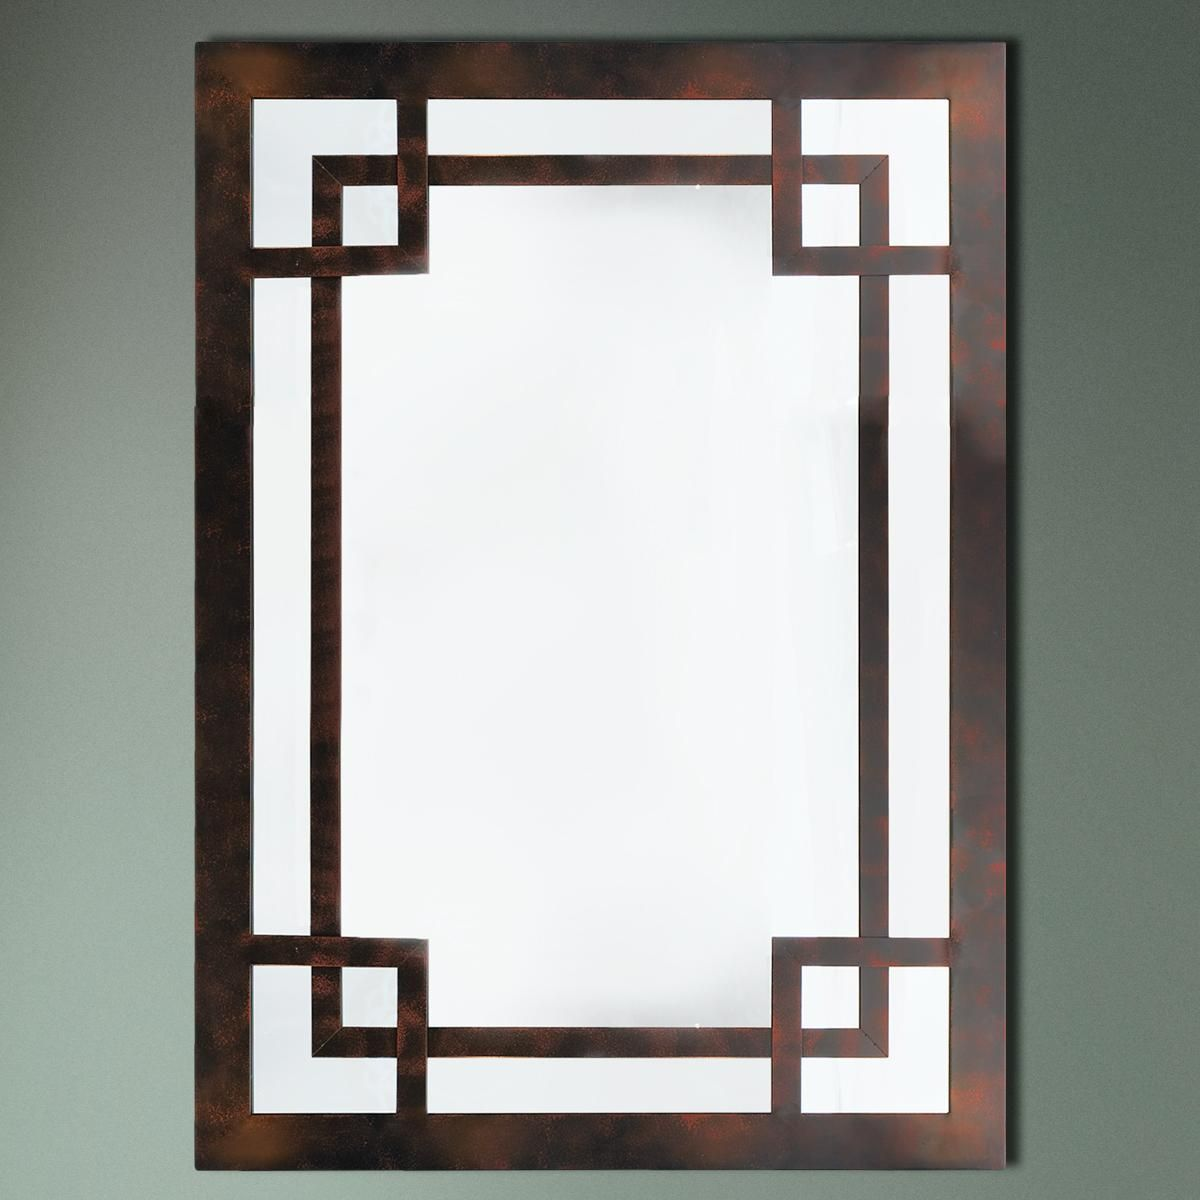 Id 361 bg greek key framed mirror id project inspiration id 361 bg greek key framed mirror jeuxipadfo Choice Image